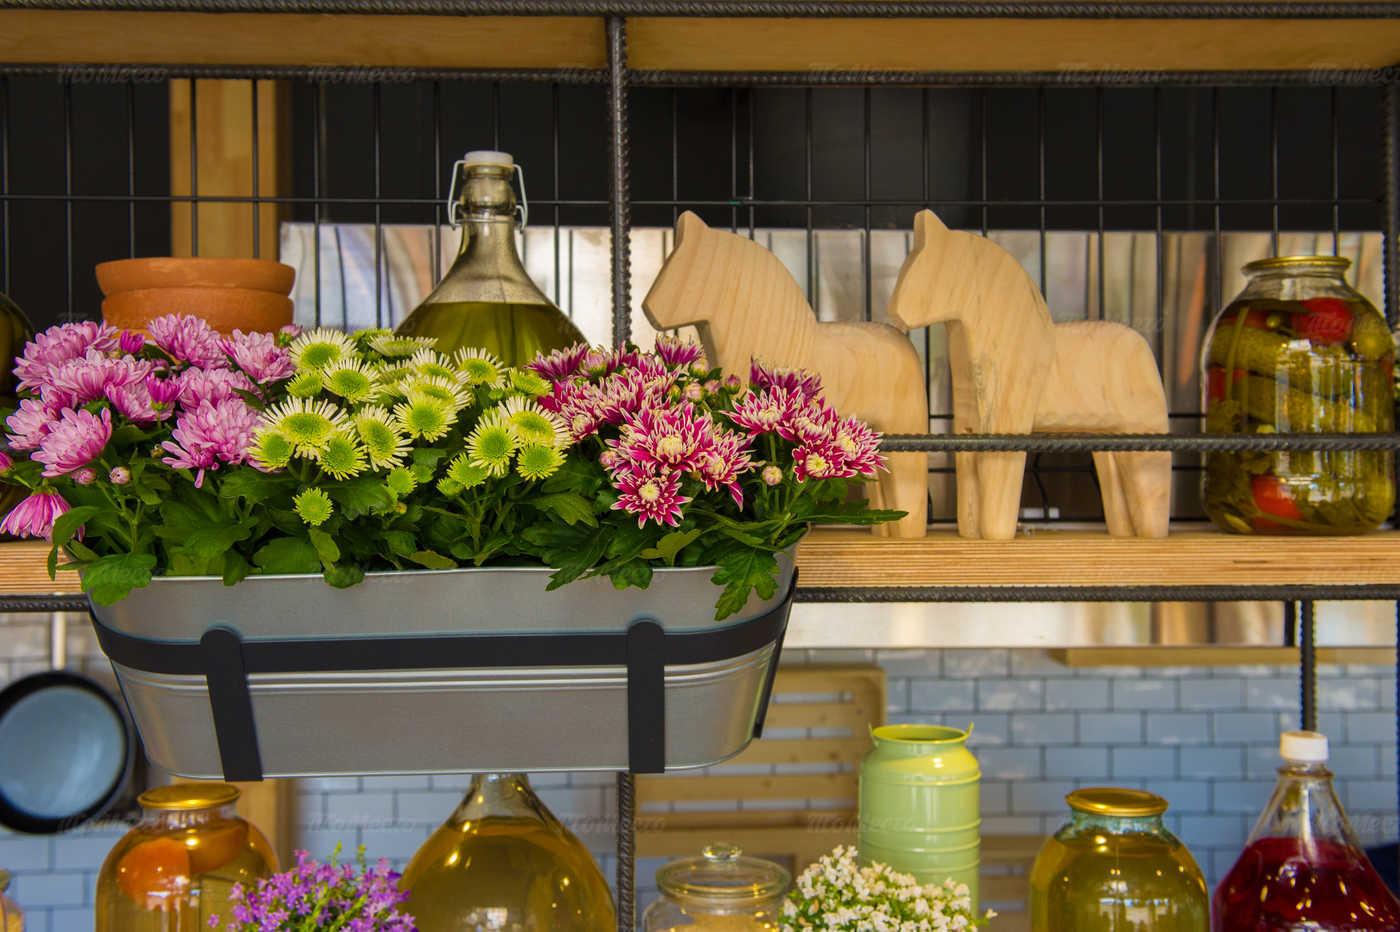 Банкеты ресторана FOOD BAZAR (Фуд базар) на улице Каретный Ряд фото 8